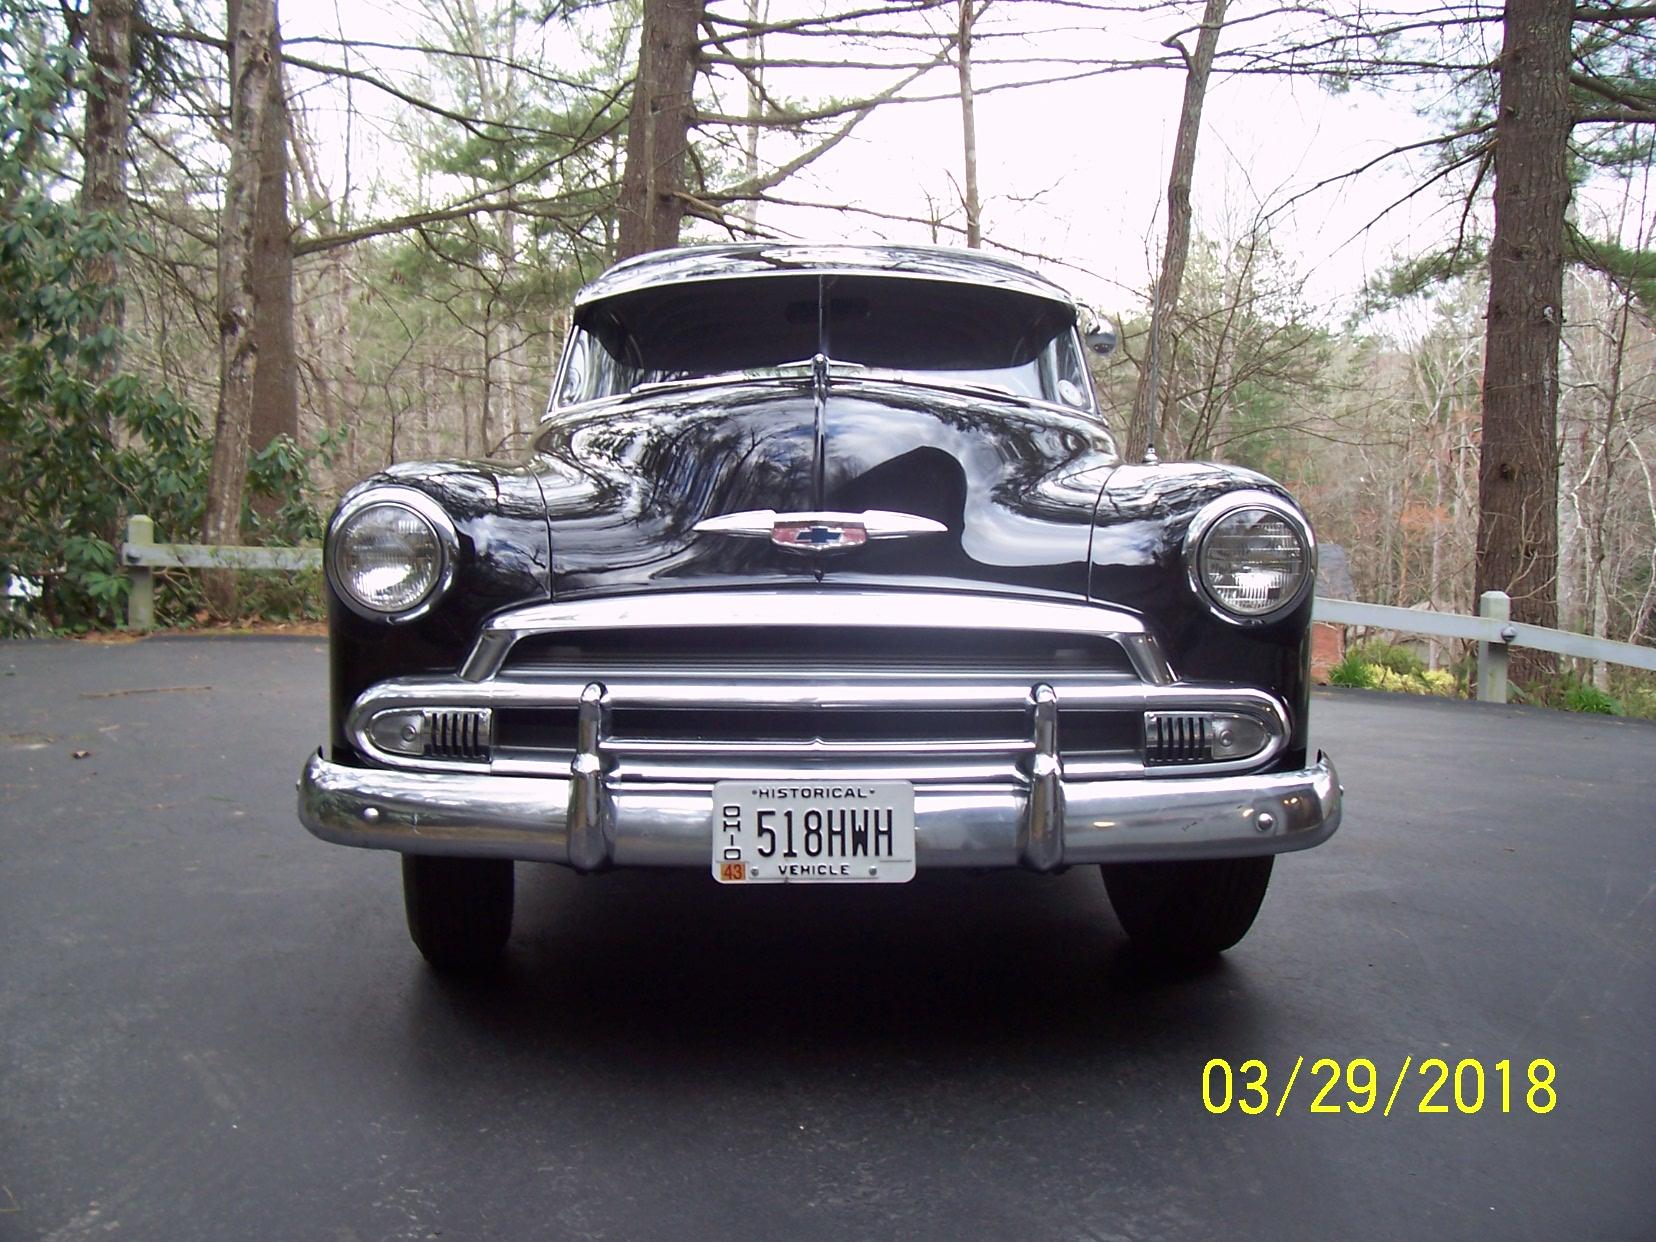 1951 Chevrolet Styleline Deluxe 2 Door Sedan Cars For Sale Chevy Paint Colors 104 5592